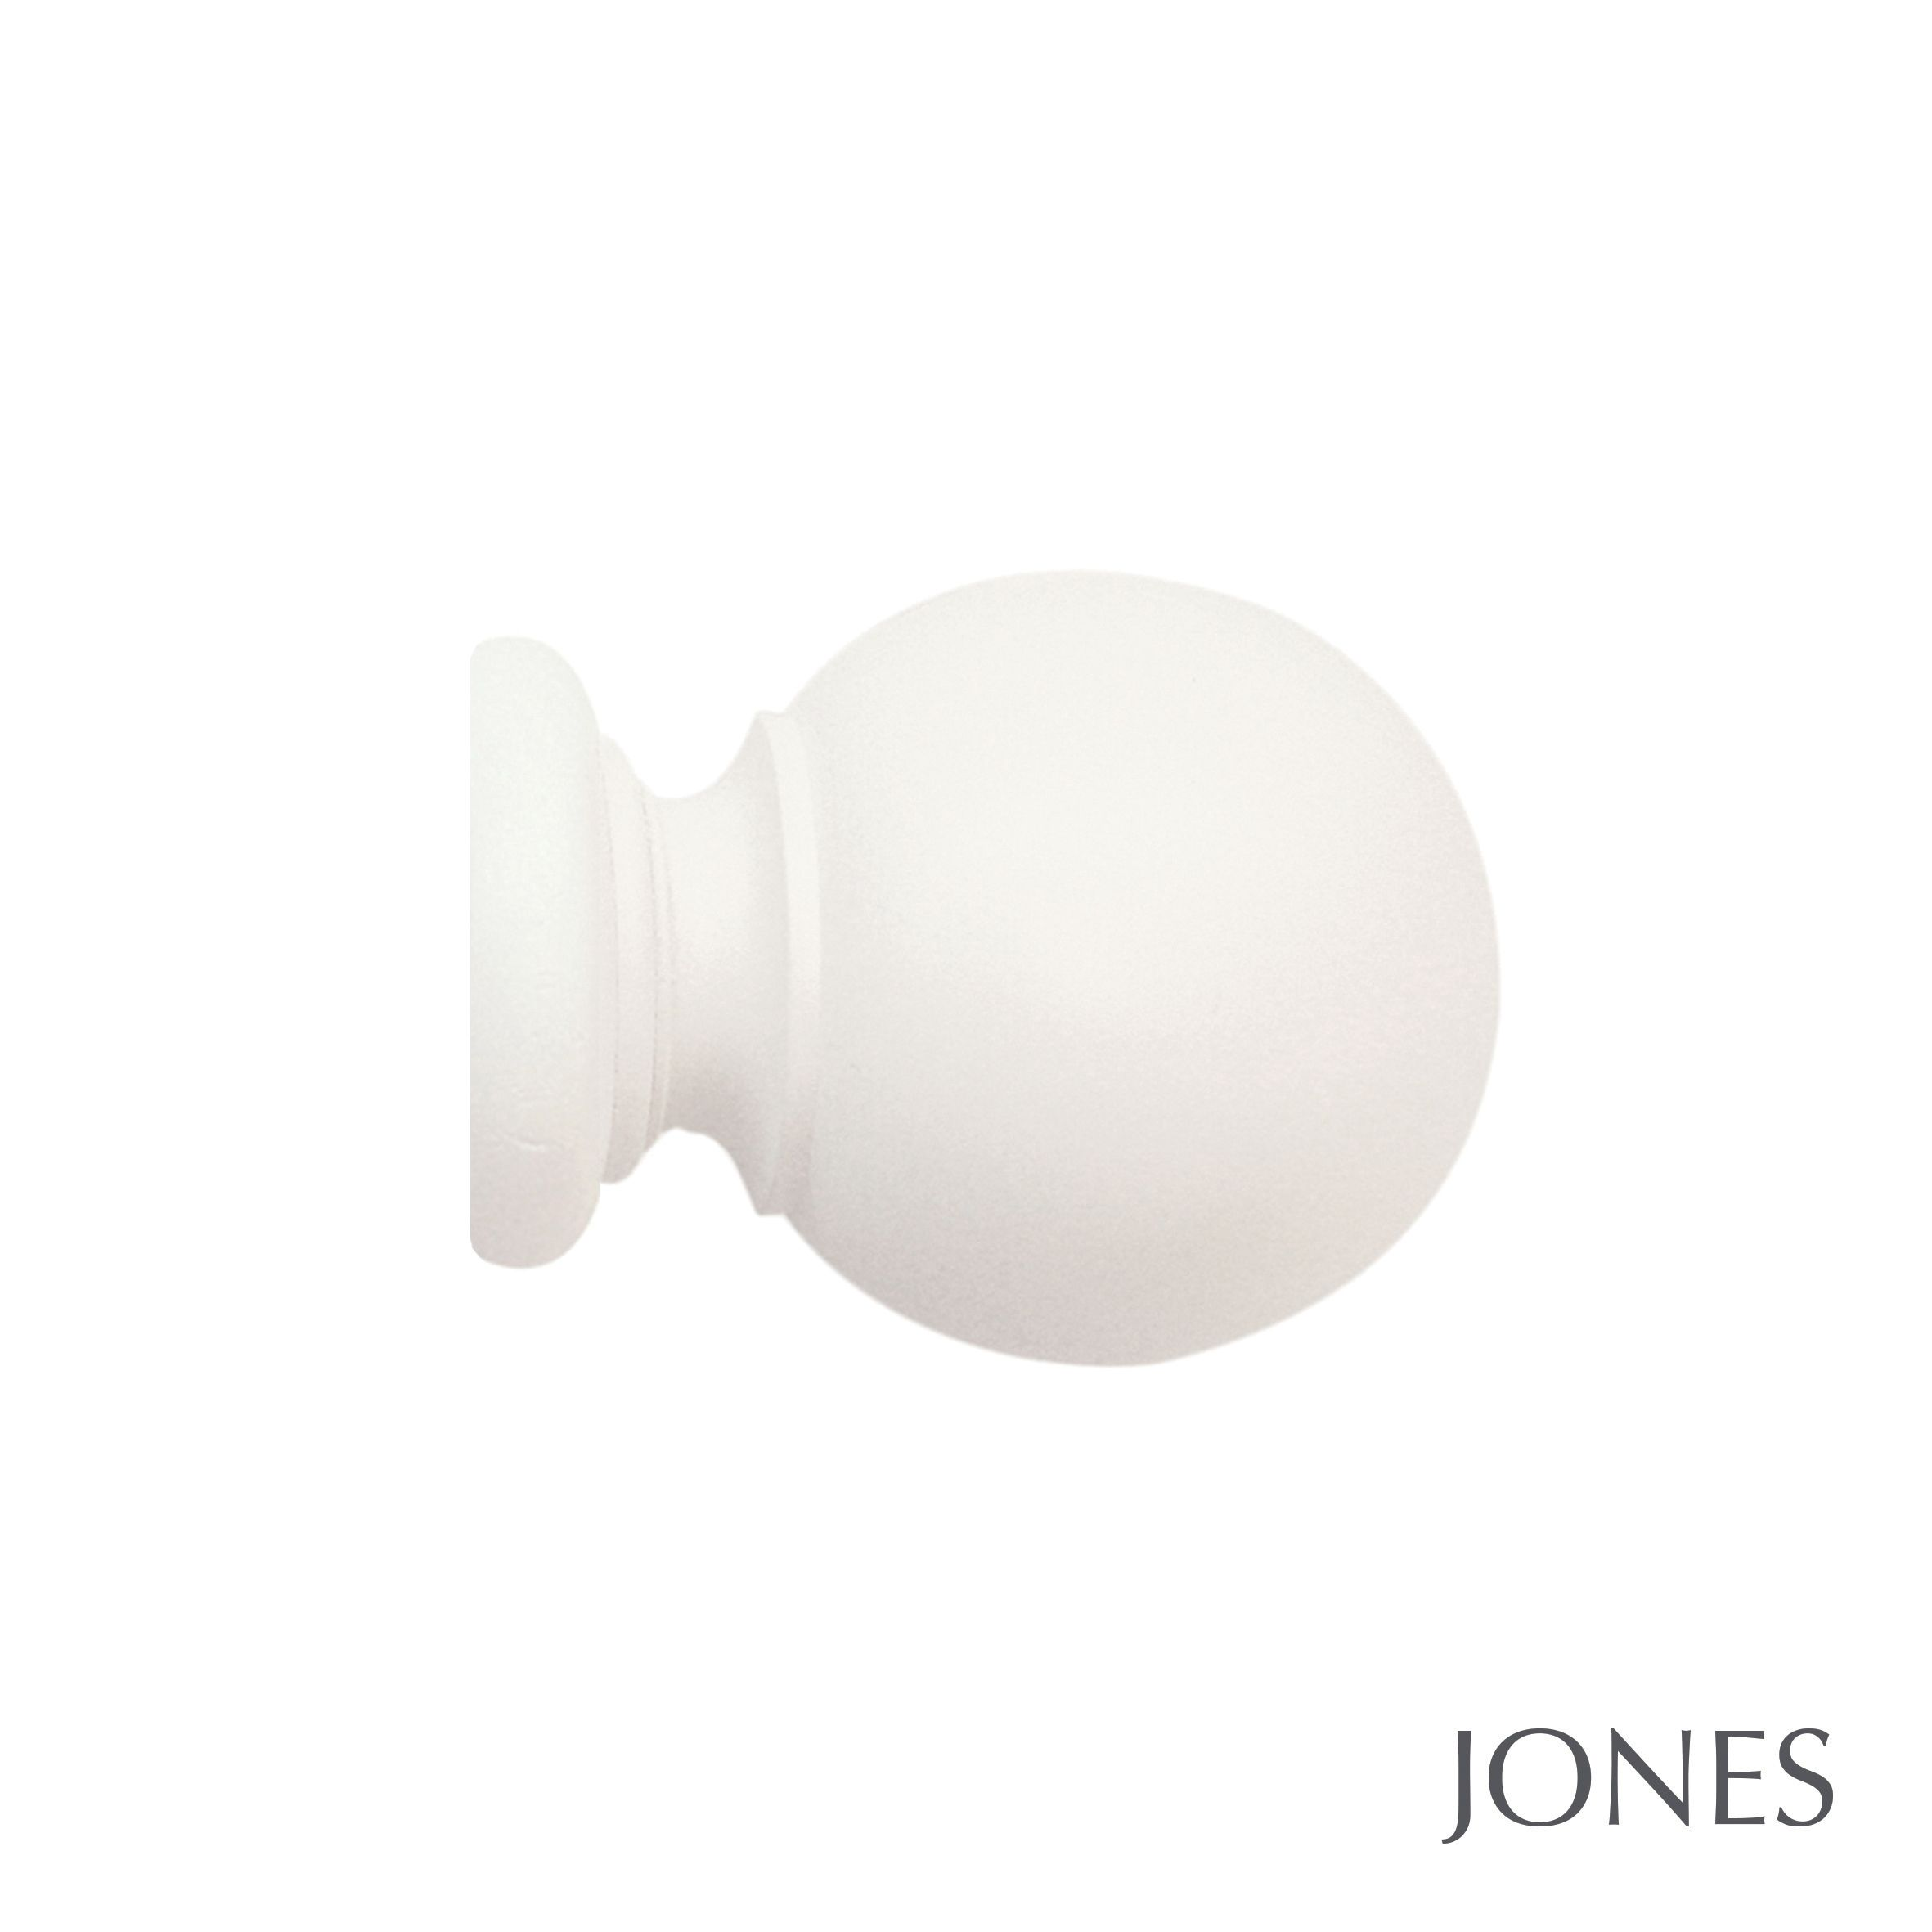 40mm Jones Hardwick Ball Finial cotton